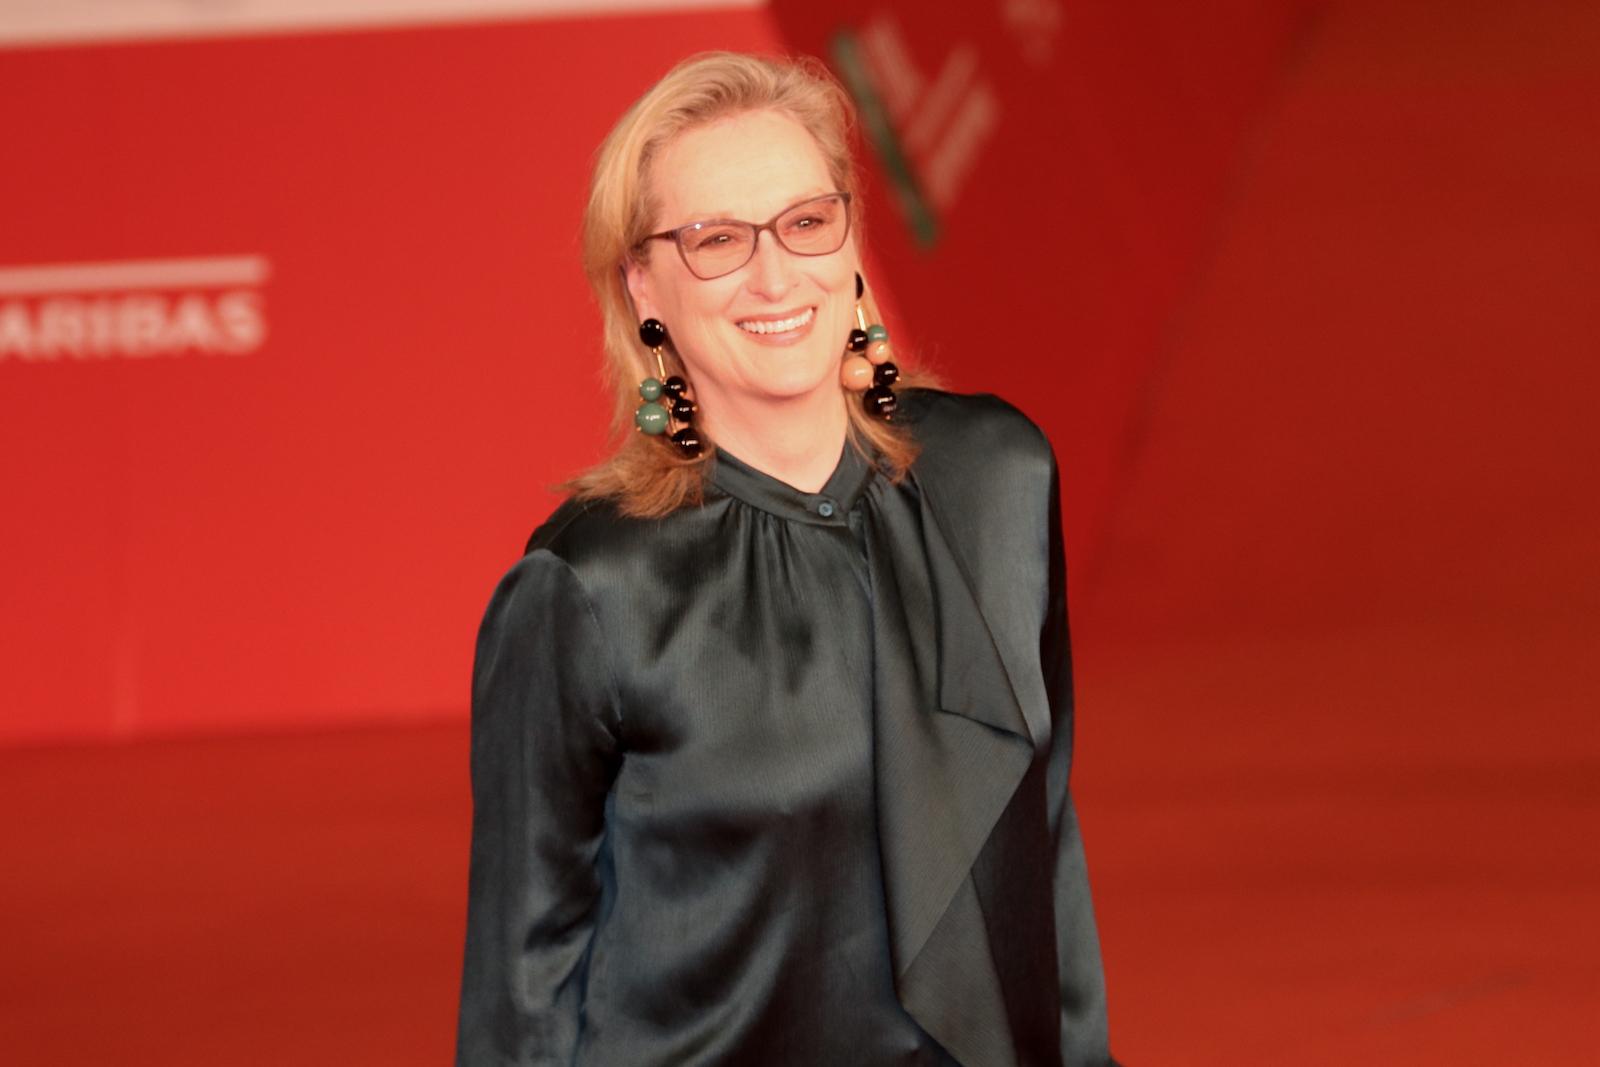 Roma 2016: Meryl Streep sul red carpet di Florence Foster Jenkins